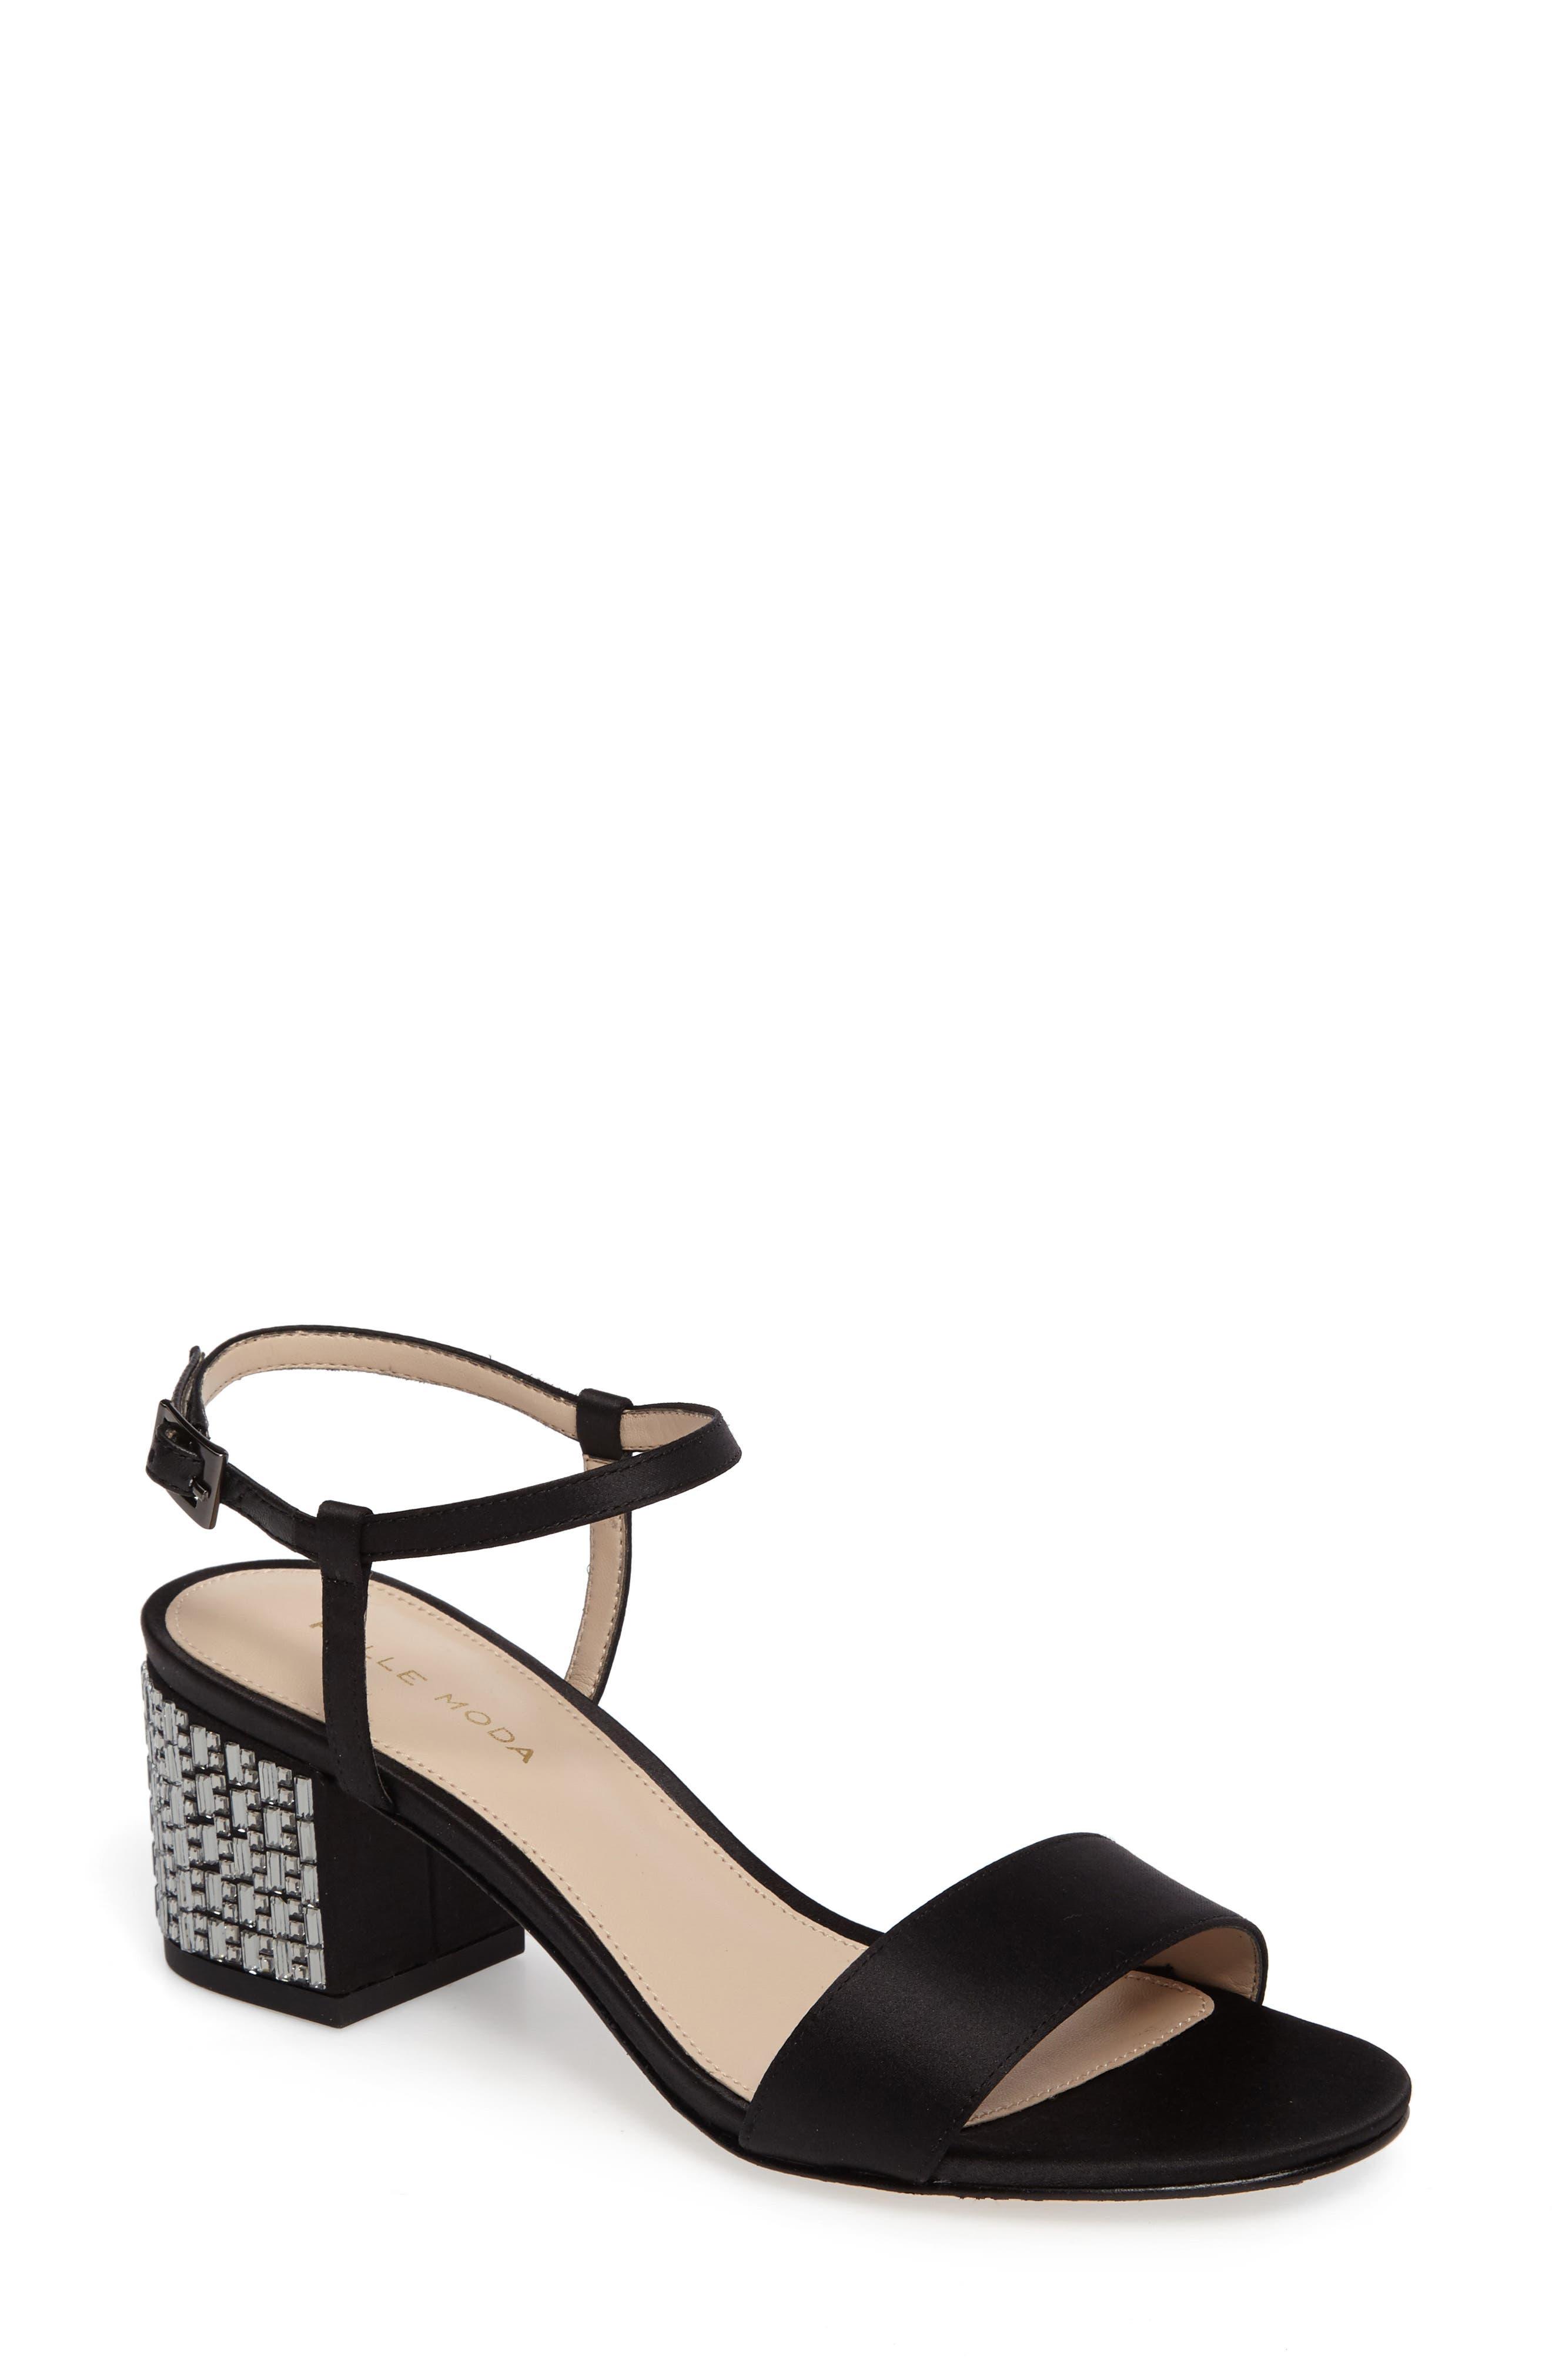 Pelle Moda Alicia Block Heel Sandal (Women)